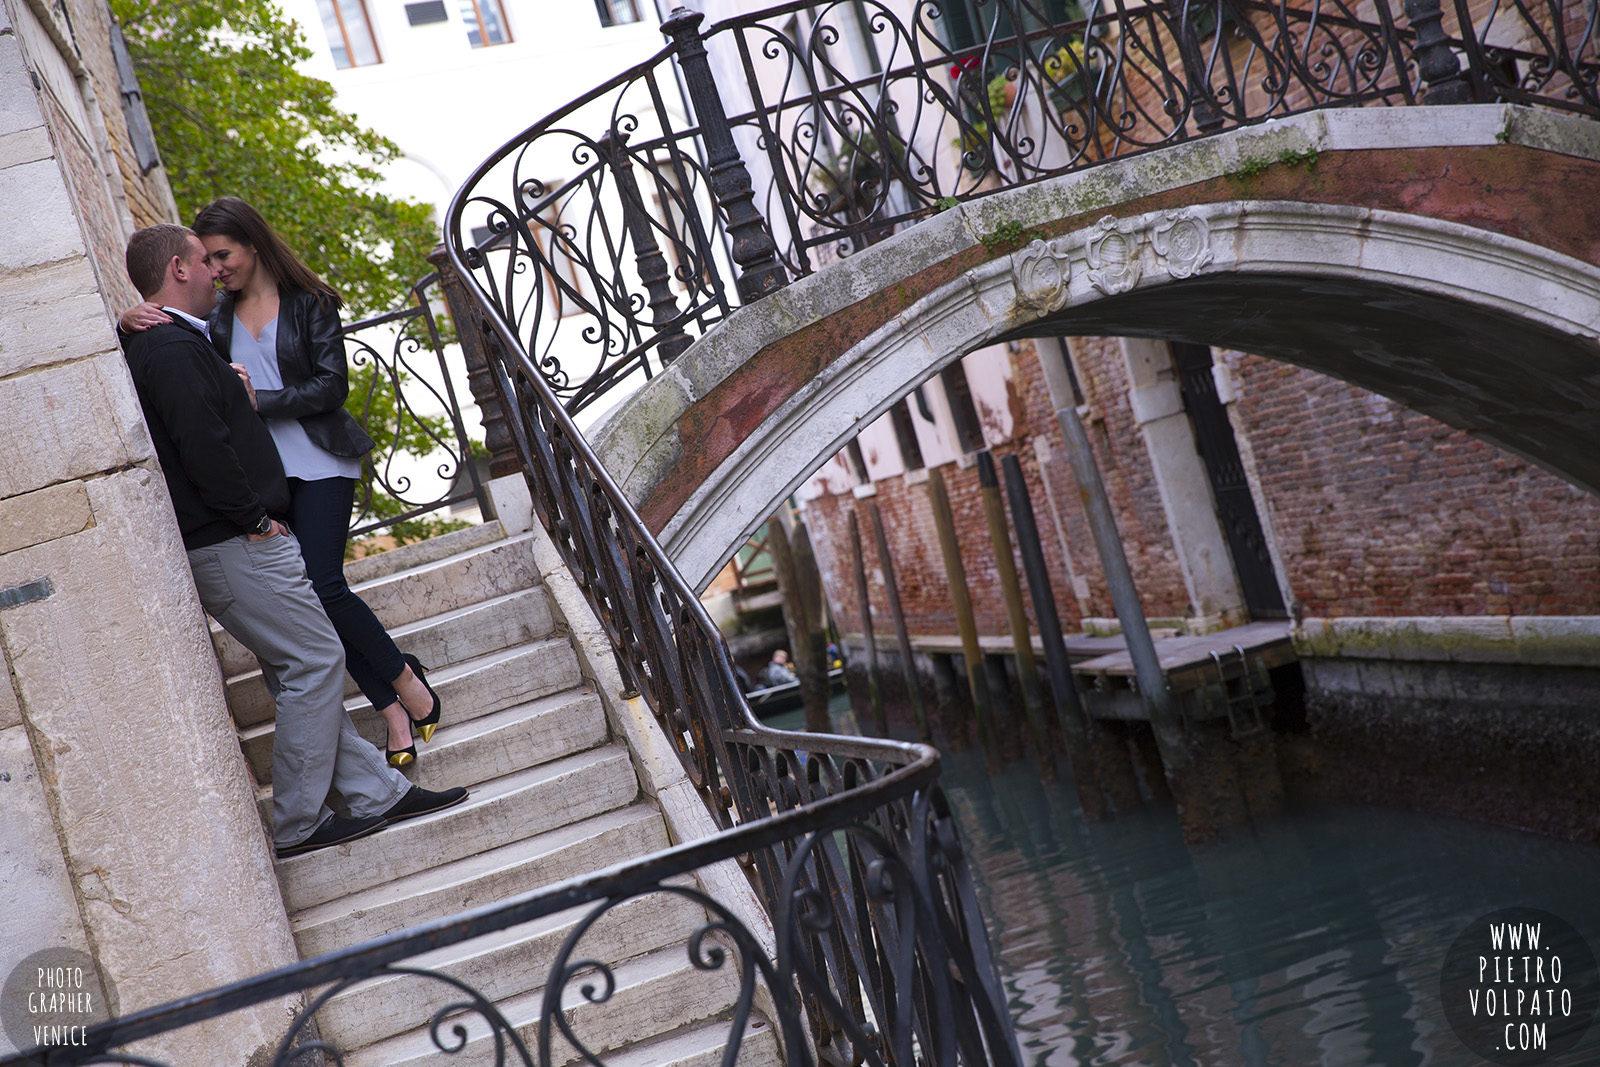 pre-wedding-love-story-photoshoot-in-venice-italy-photographer-pietro-volpato-20161229_06